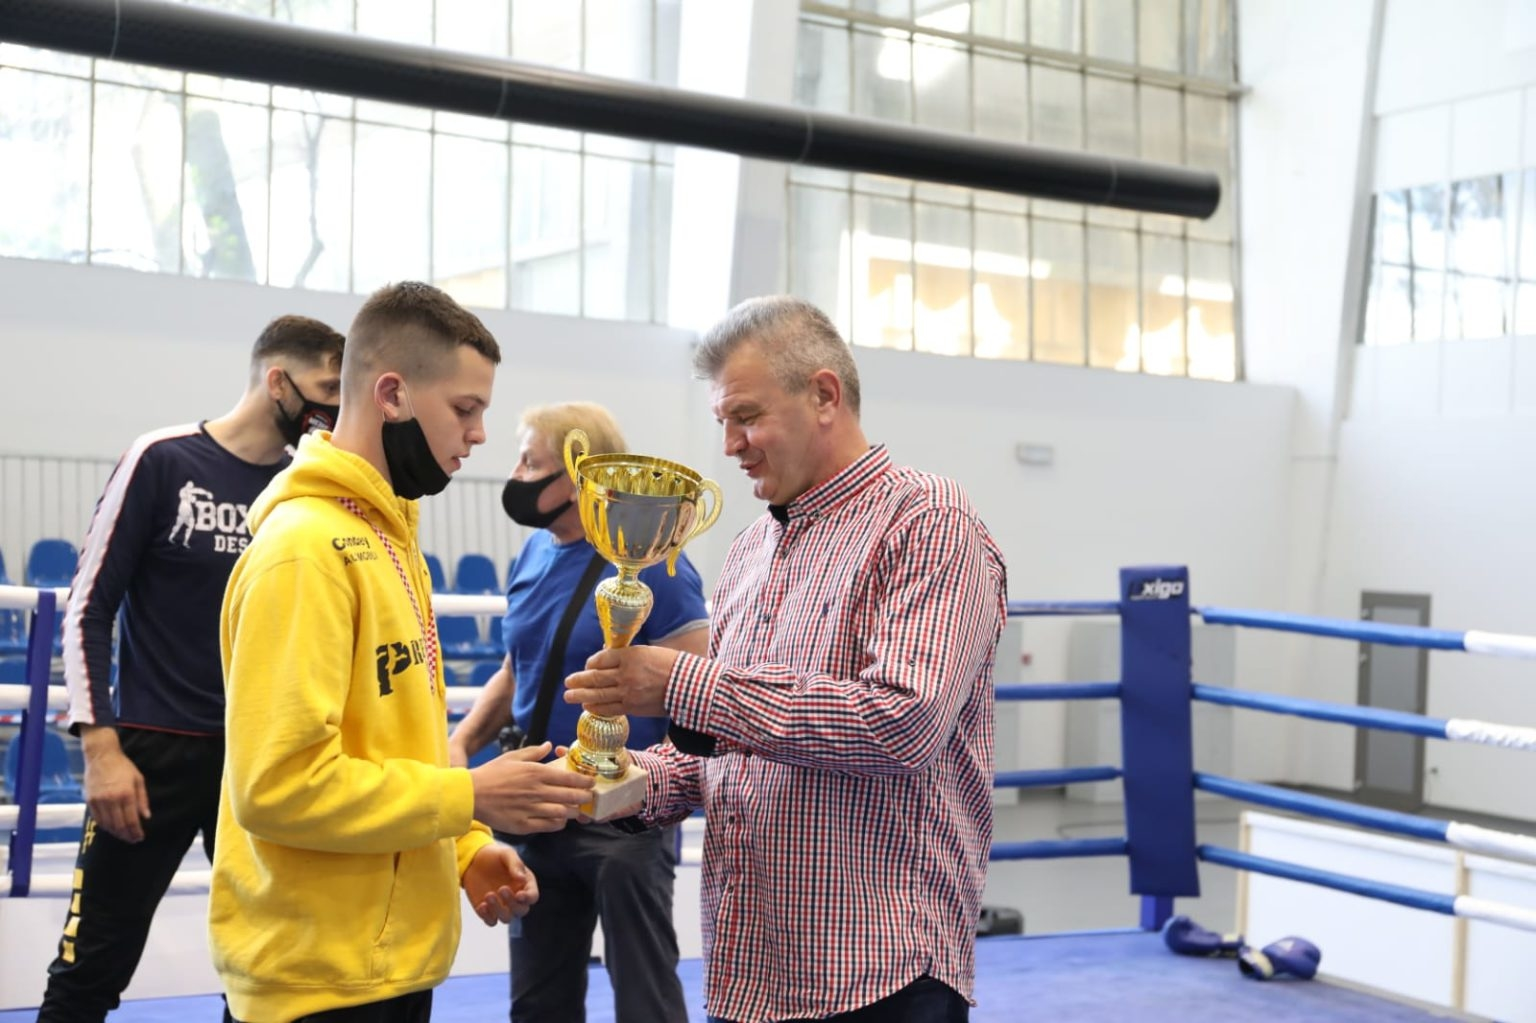 Mauro Kolenc dobio je priznanje za najboljeg boksača